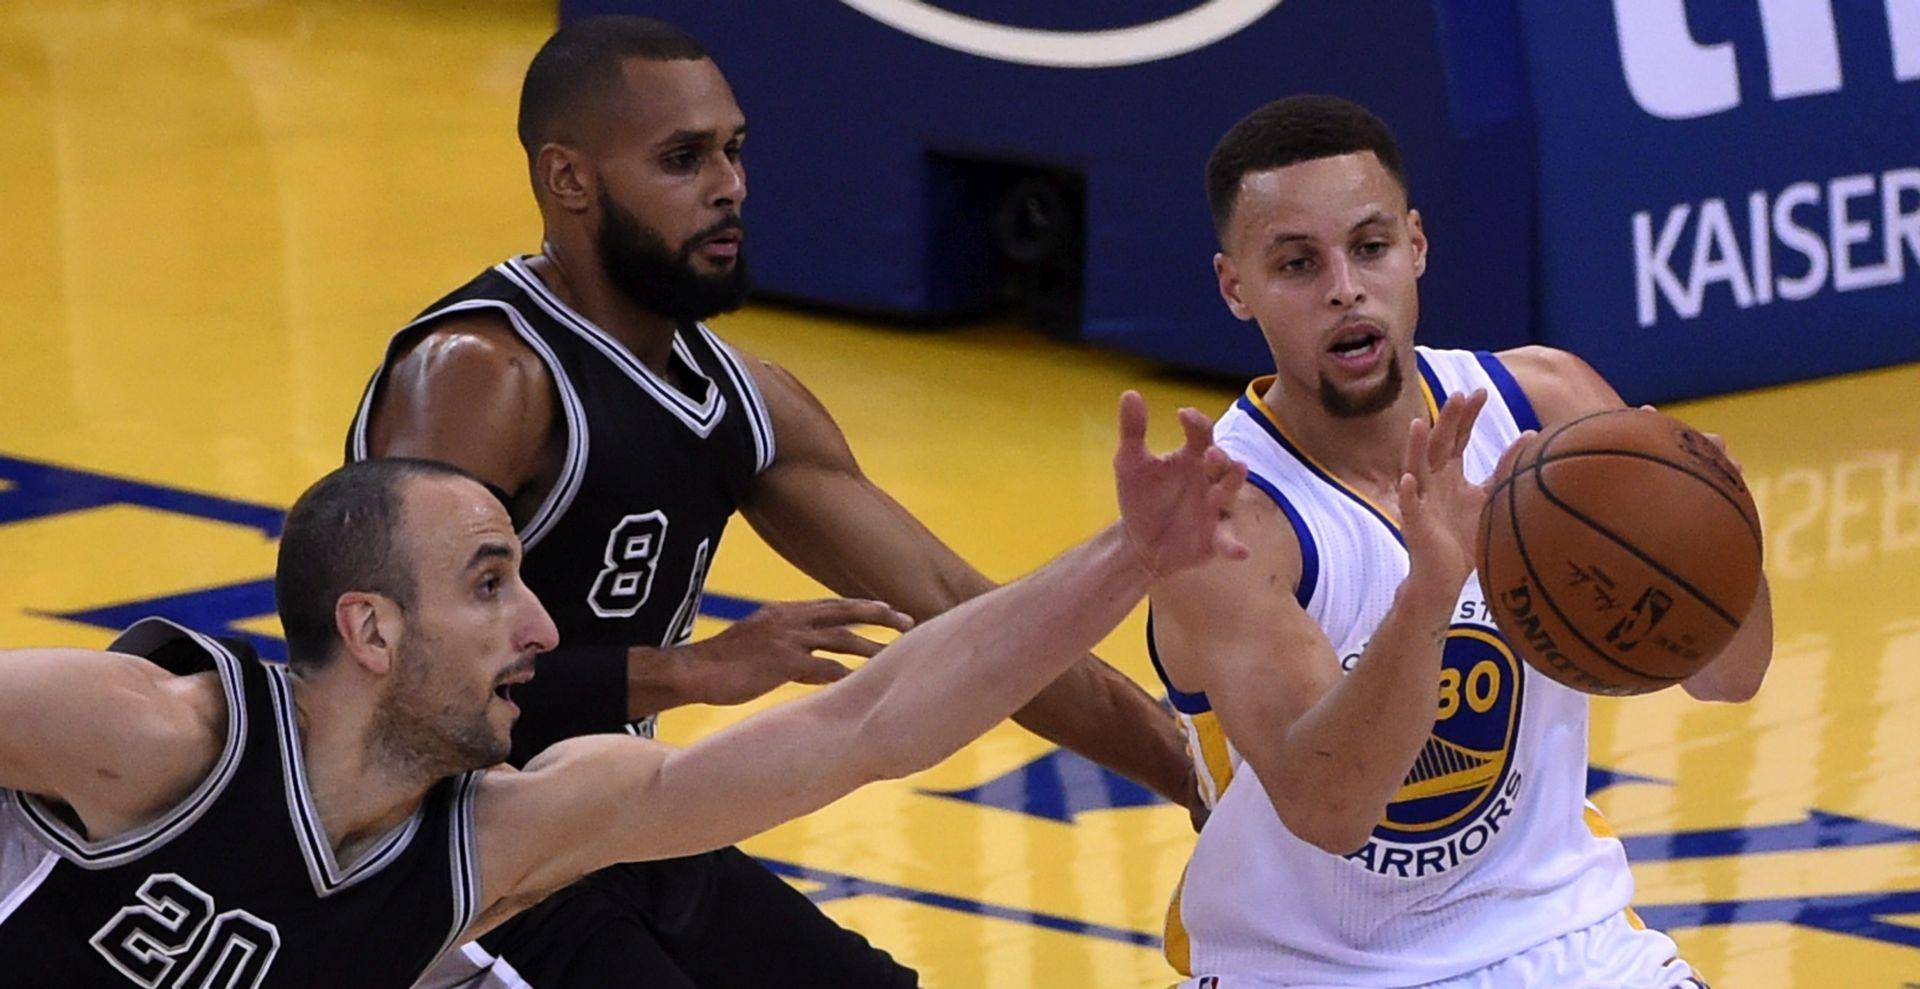 VIDEO: NBA Warriorsi rekordno do 50. pobjede u sezoni